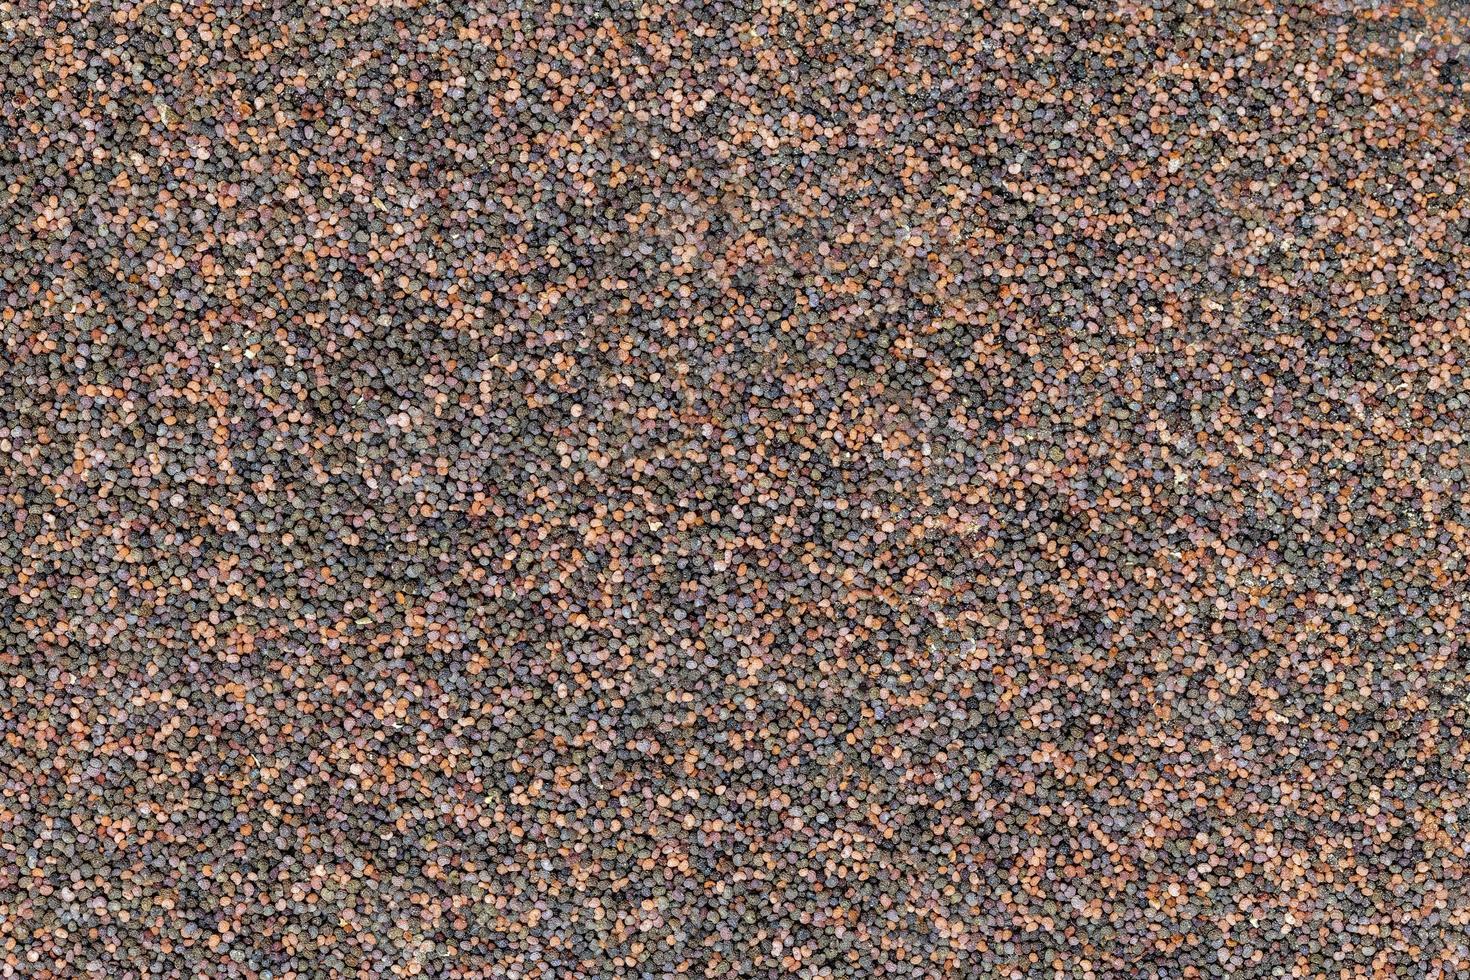 fundo de sementes de papoula distribuídas uniformemente em cores diferentes foto